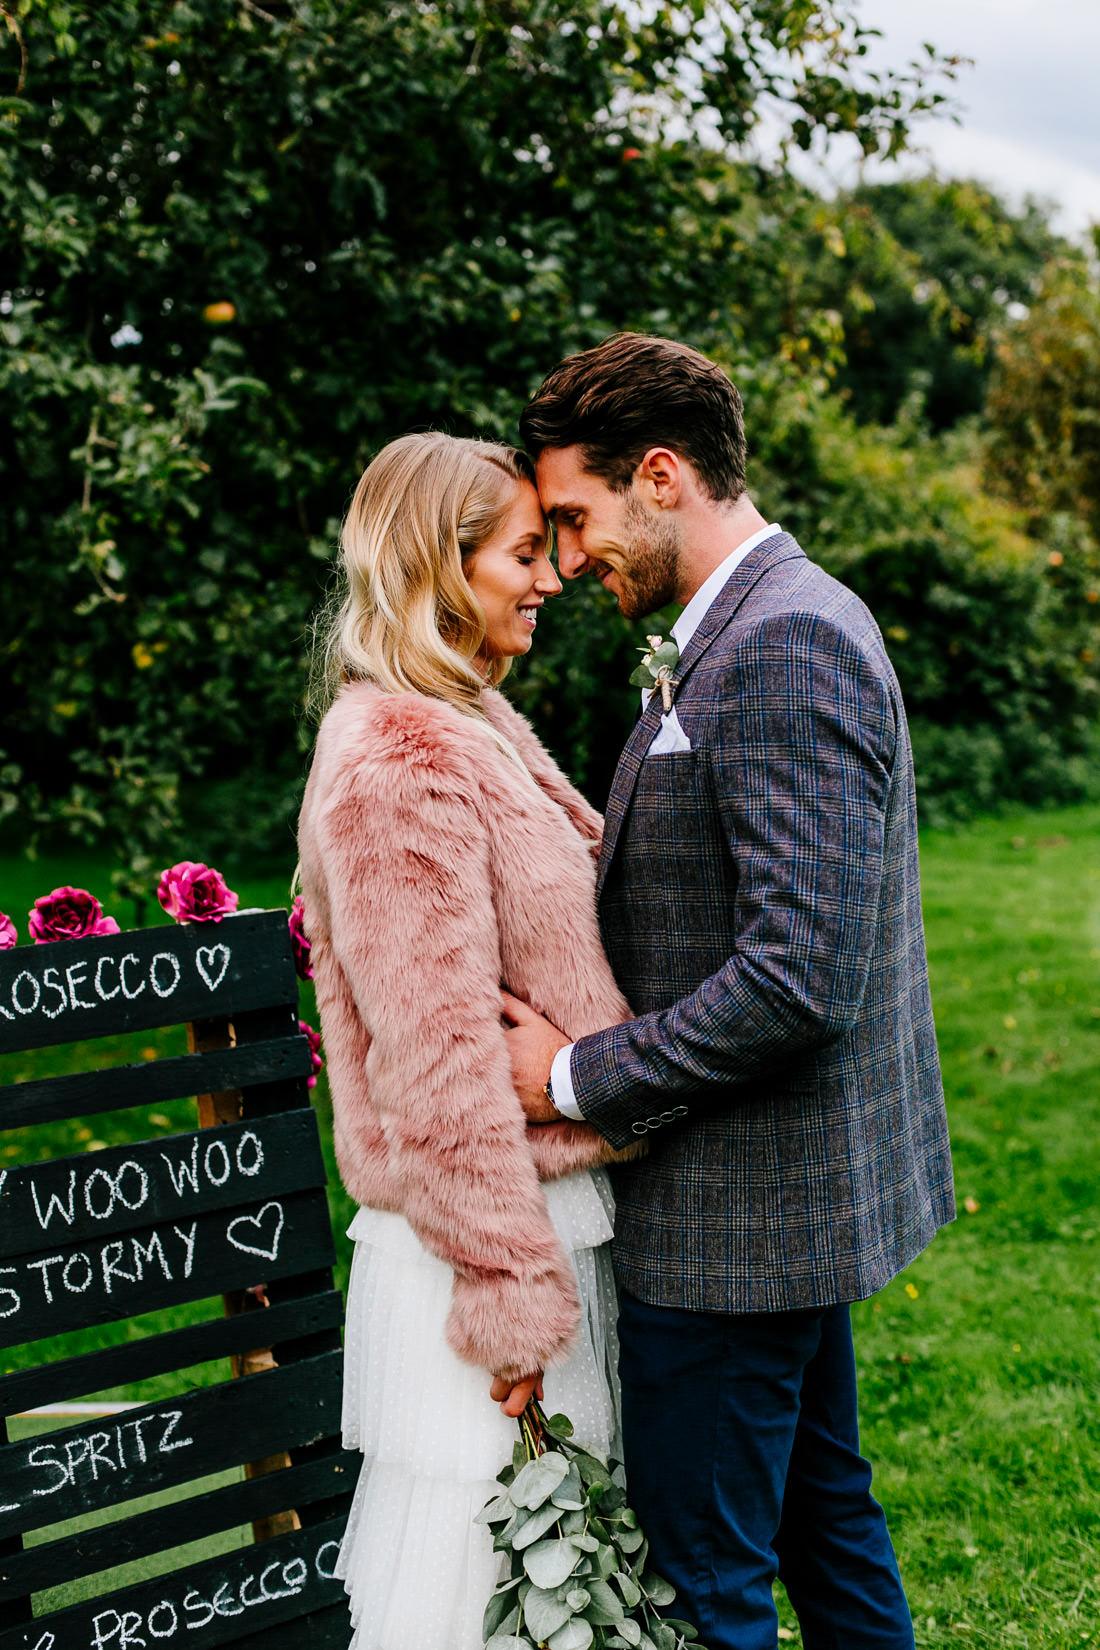 Cool-alternative-london-wedding-photographer-2-piece-wedding-dress-Epic-Love-Story-015